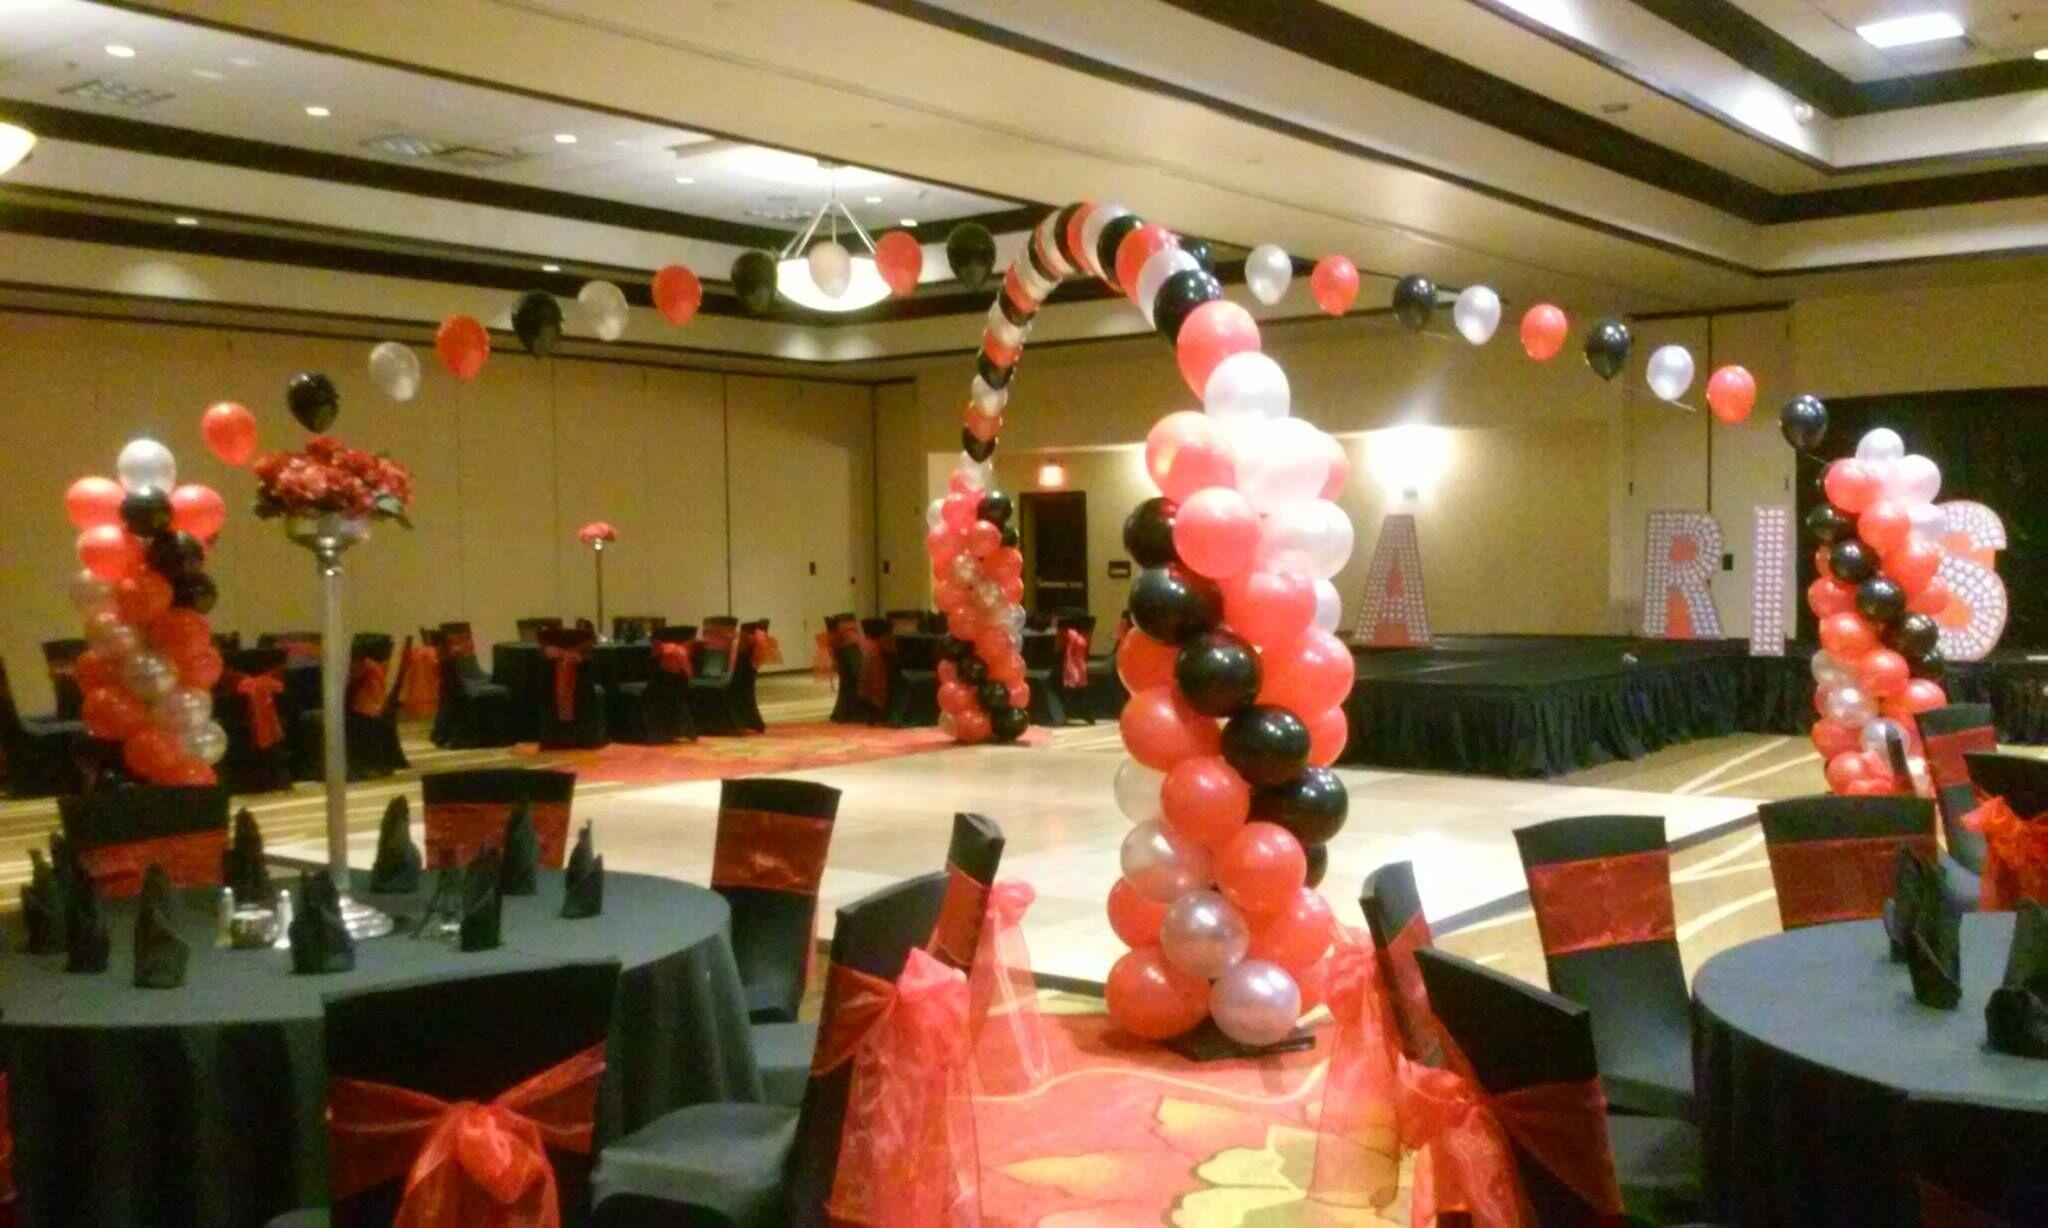 Hilton Garden Inn Dallas/Duncanville - Unveil